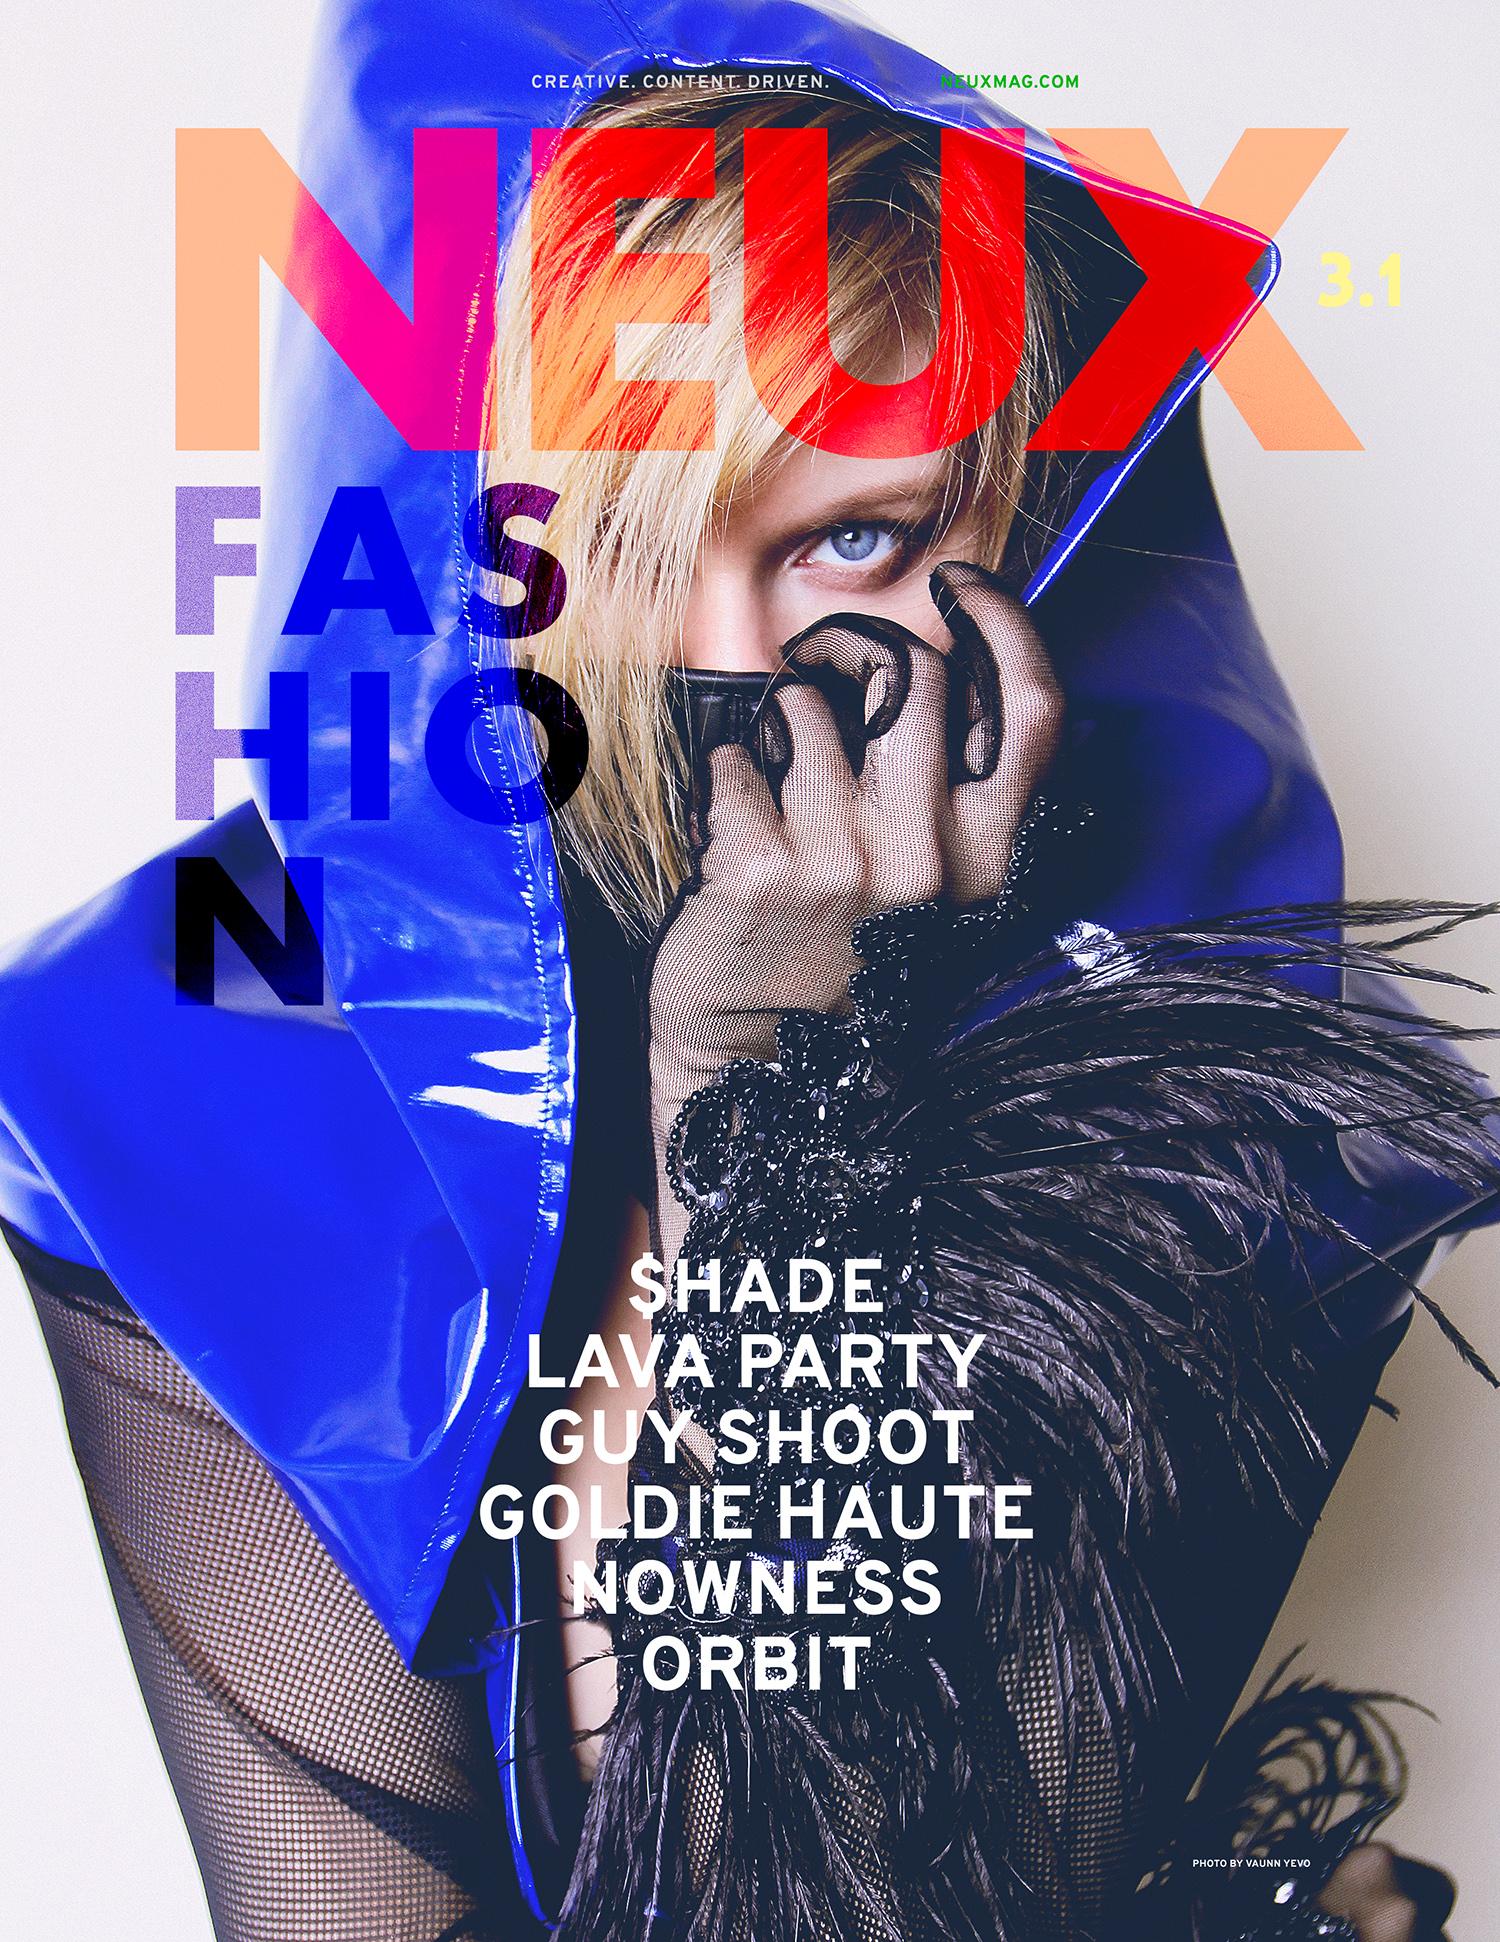 NeuxMag_Feb2018_Fashion_Cover_112017_Muse_vy_hr_preFNL_RAchelZimmerman_144ppi.jpg